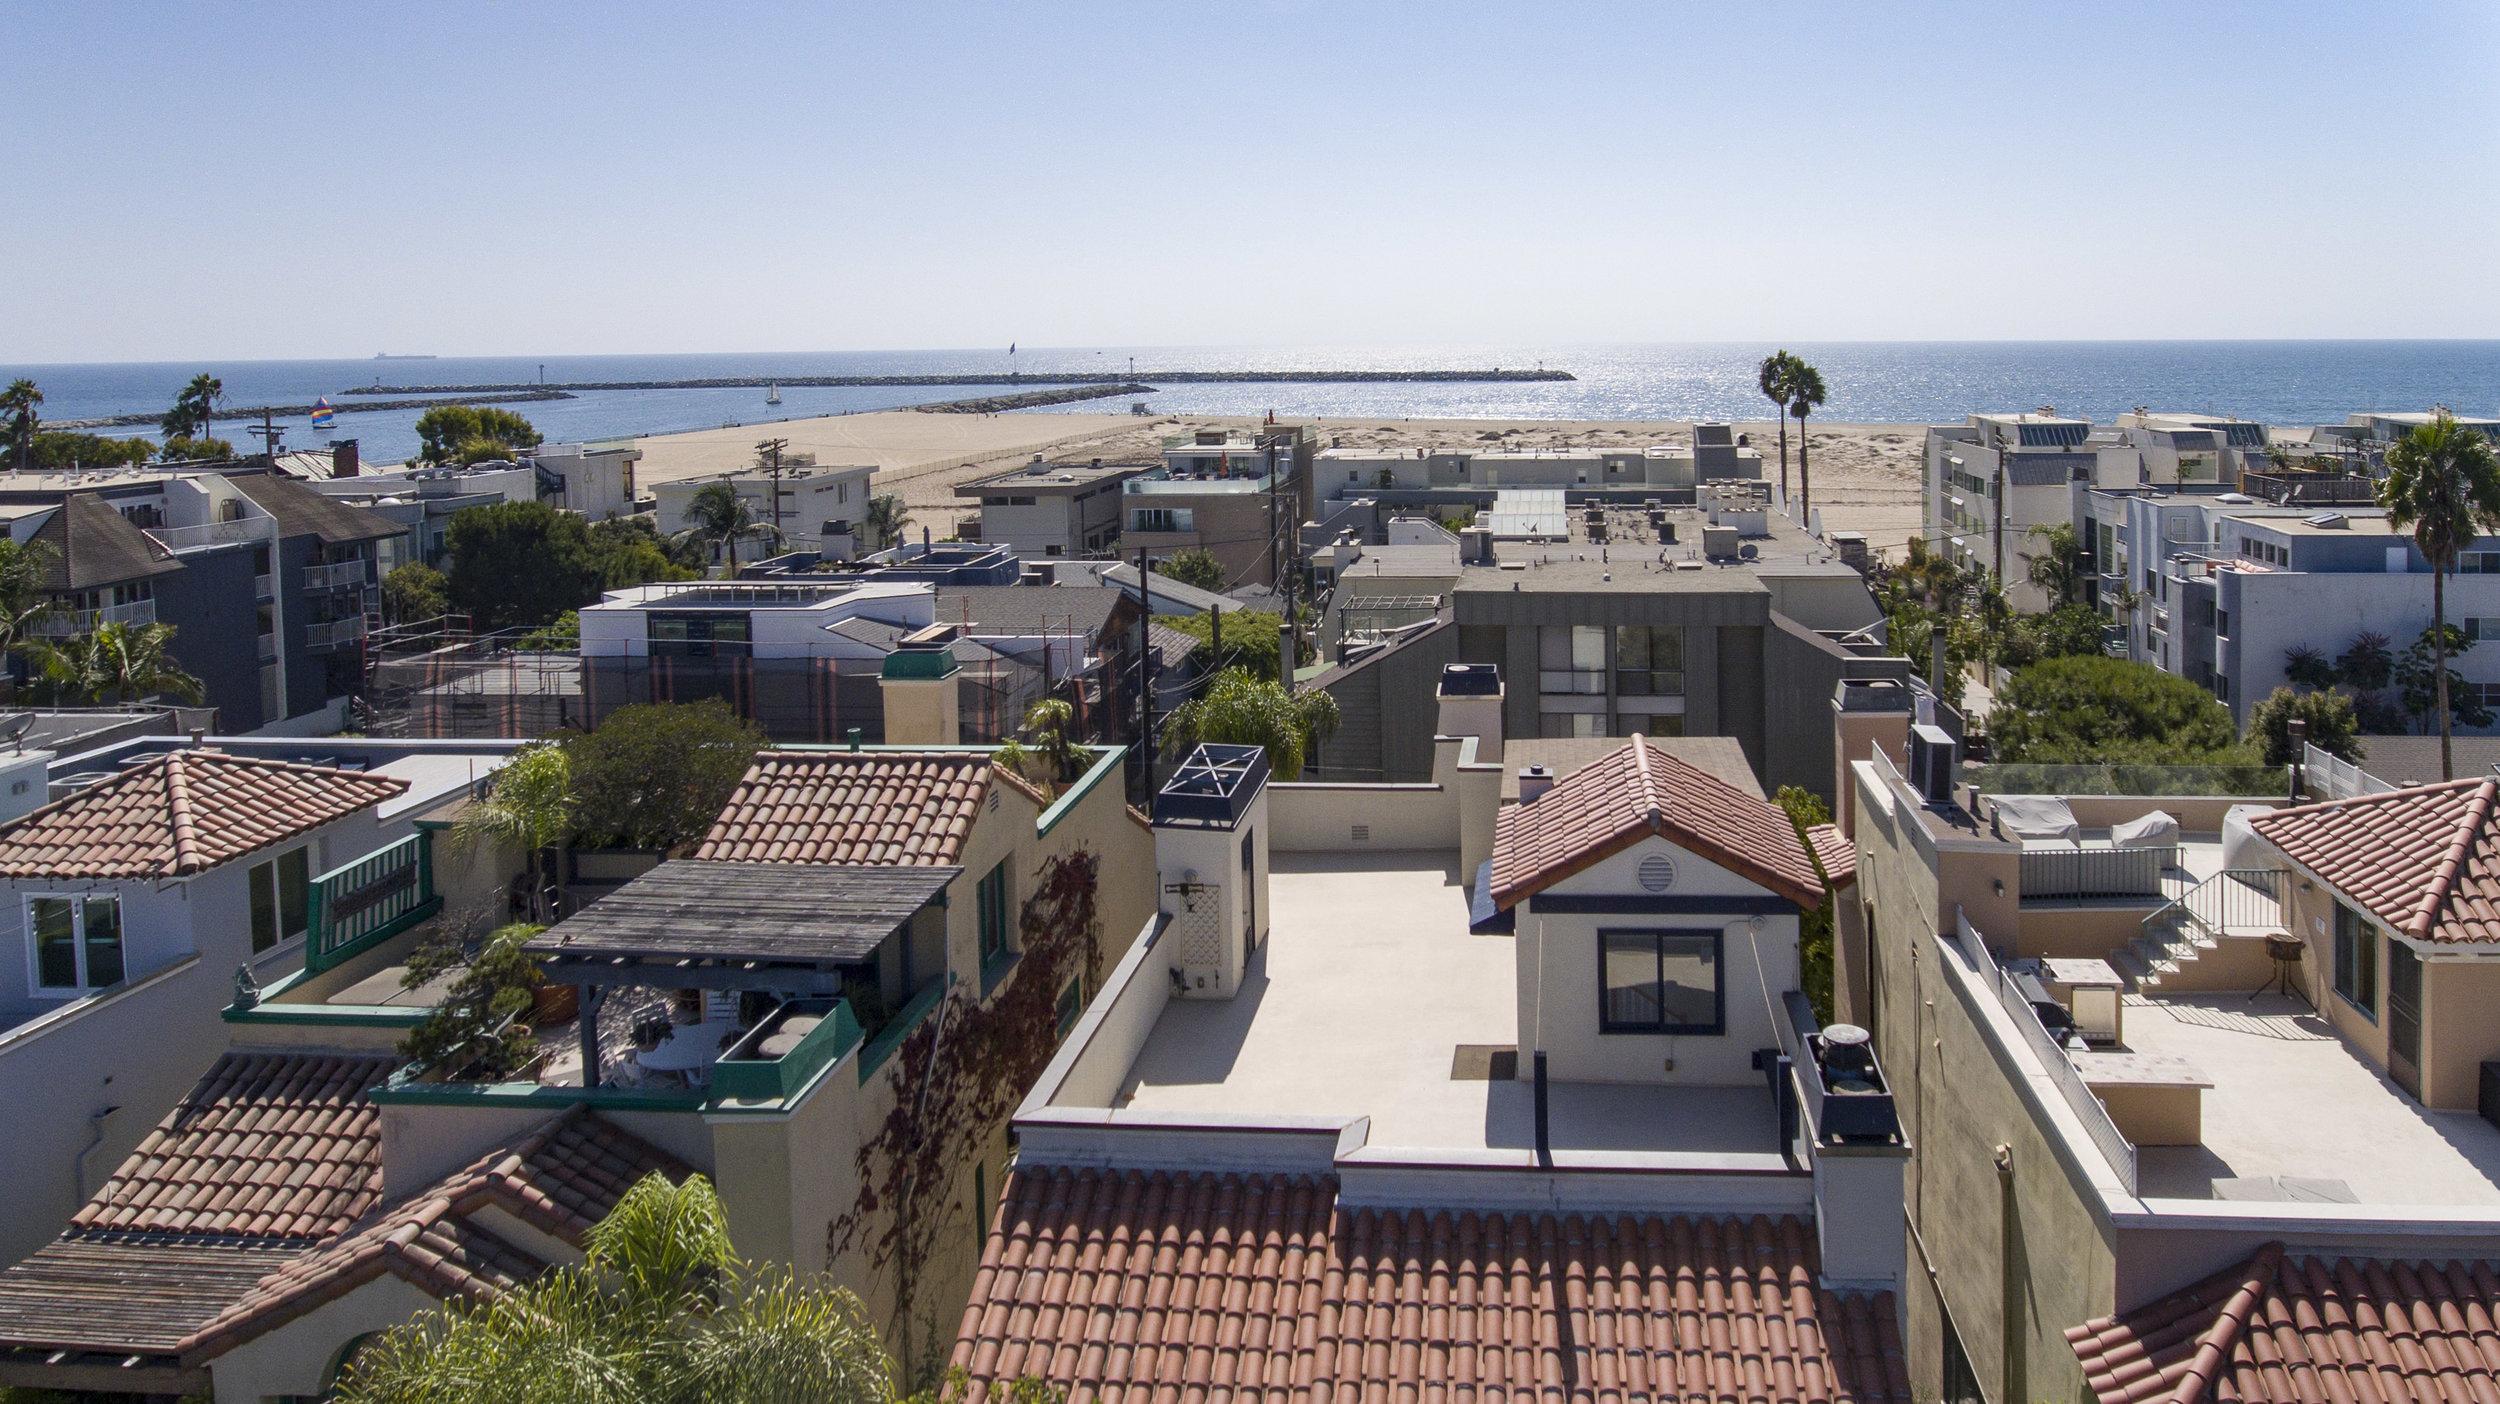 023 View Malibu For Sale Lease The Malibu Life Team Luxury Real Estate.jpg